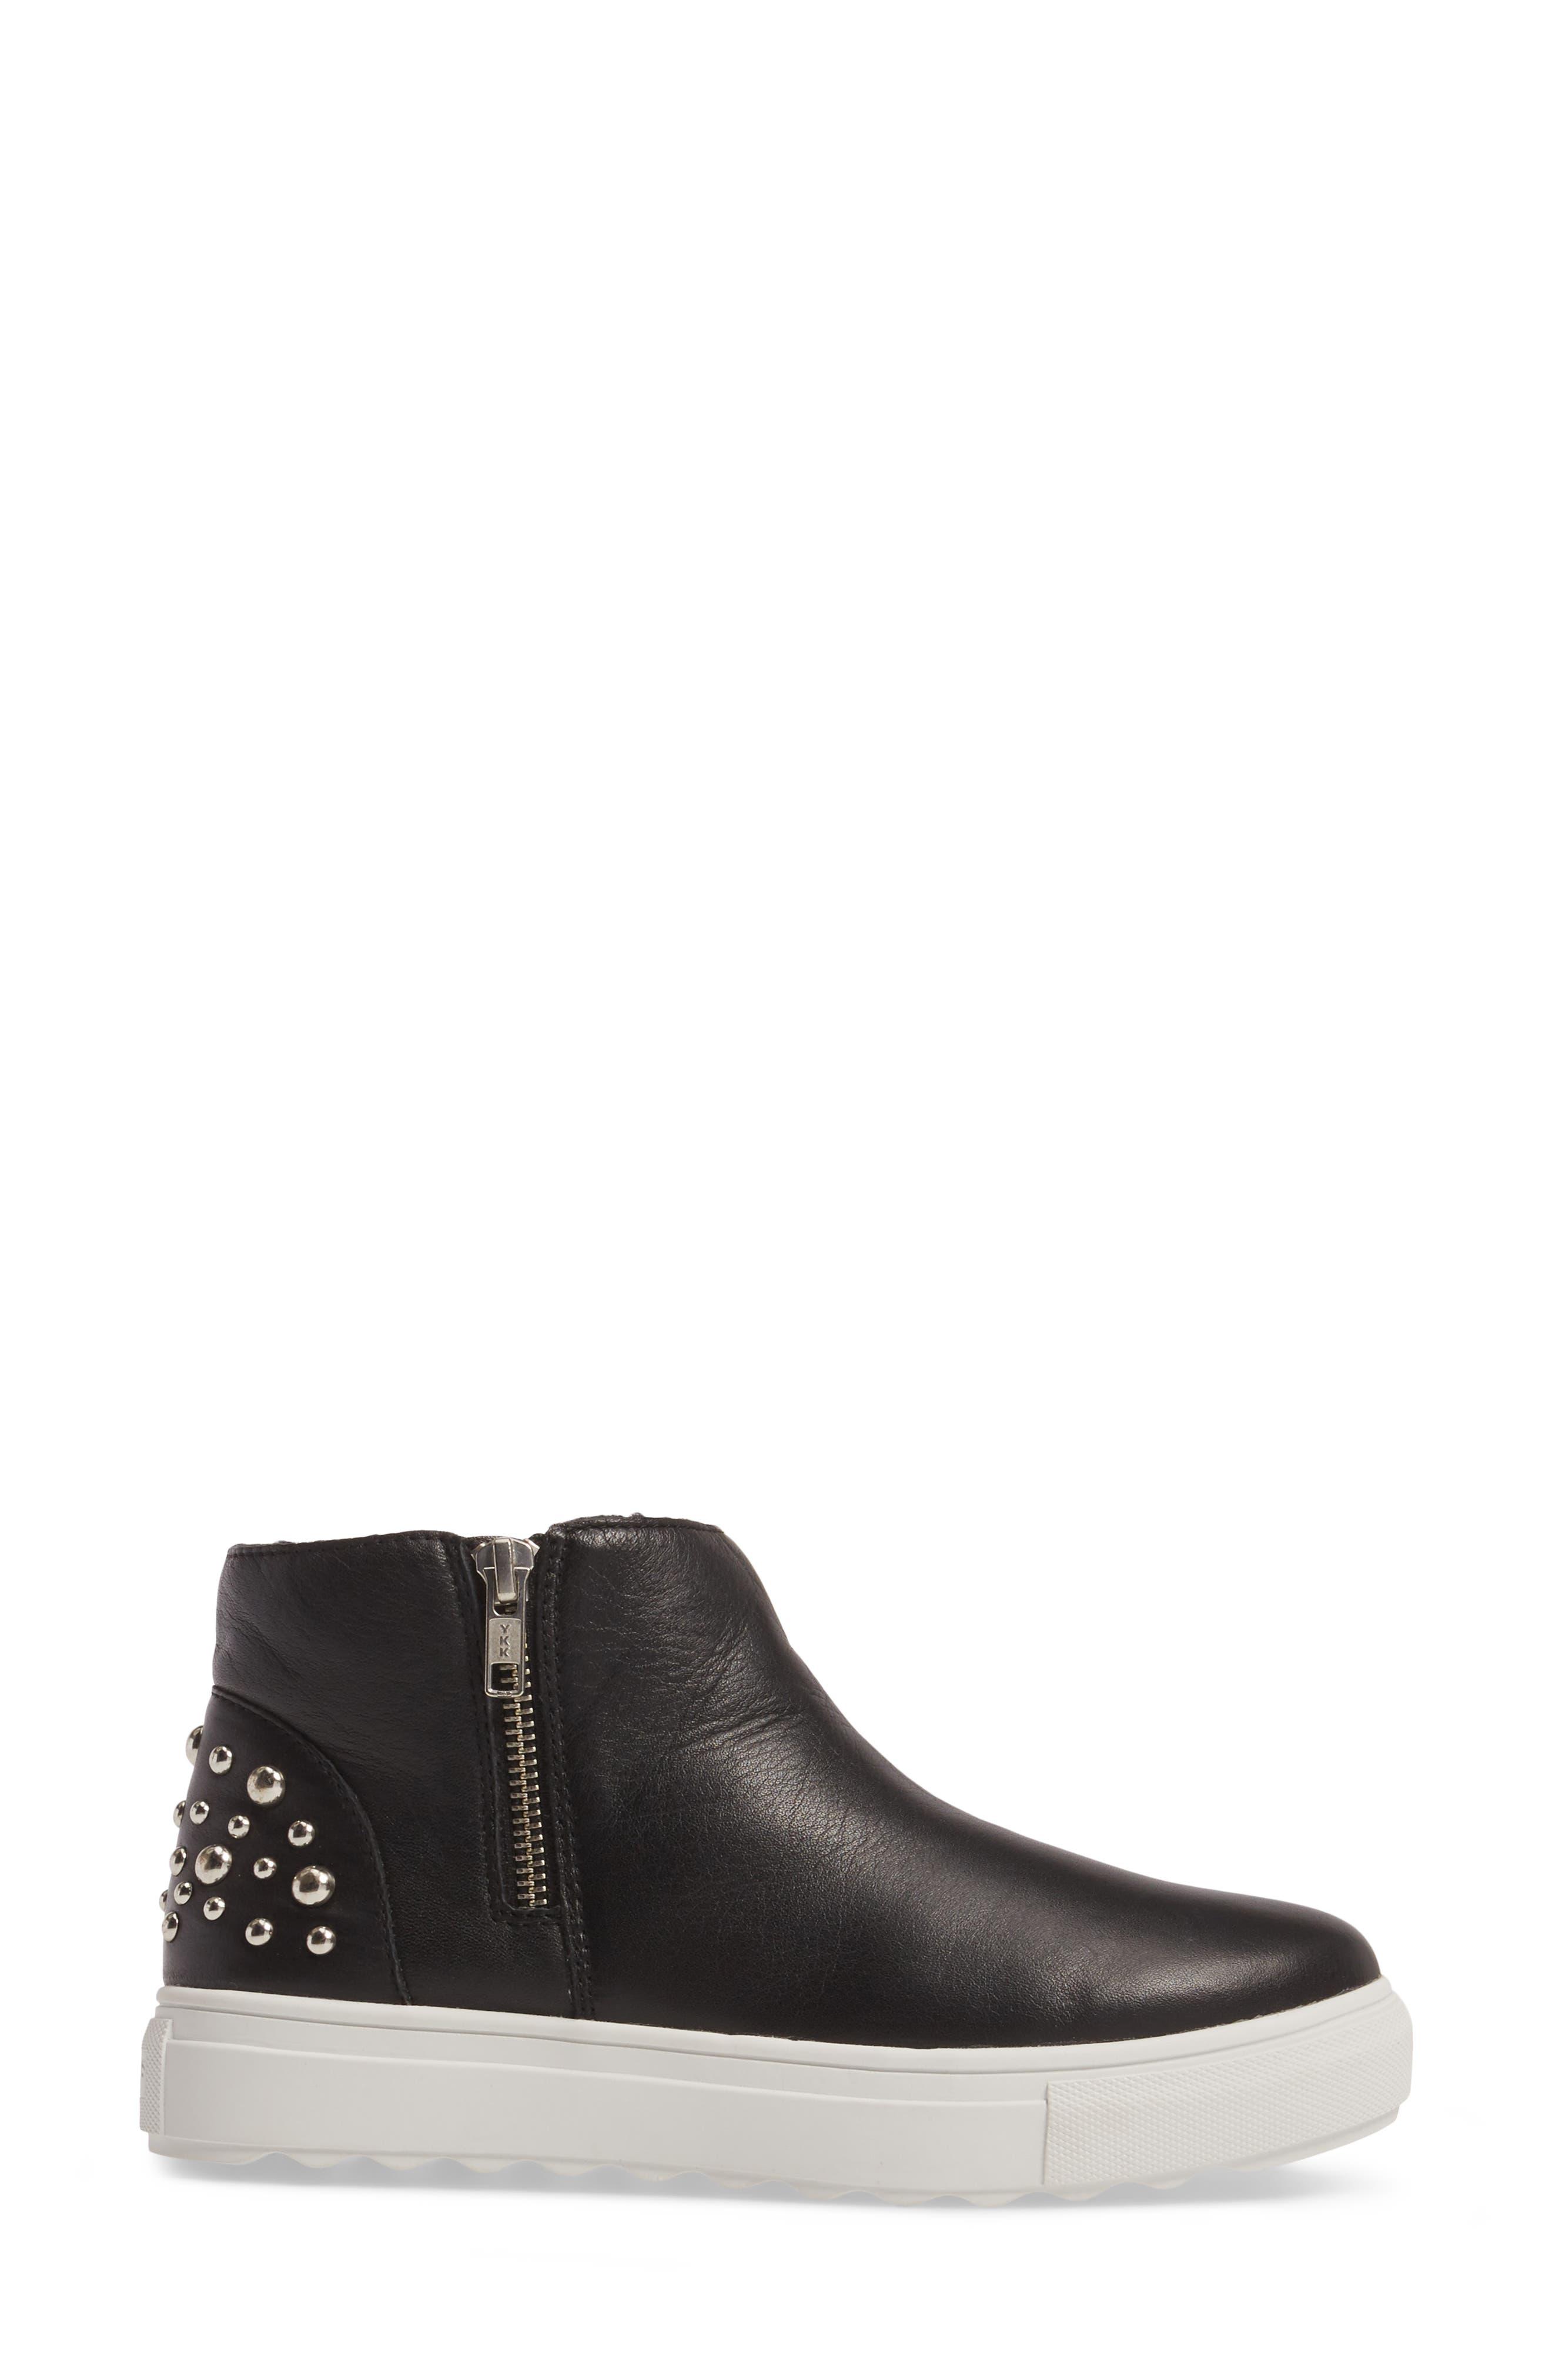 Pele Boot,                             Alternate thumbnail 3, color,                             Black Leather